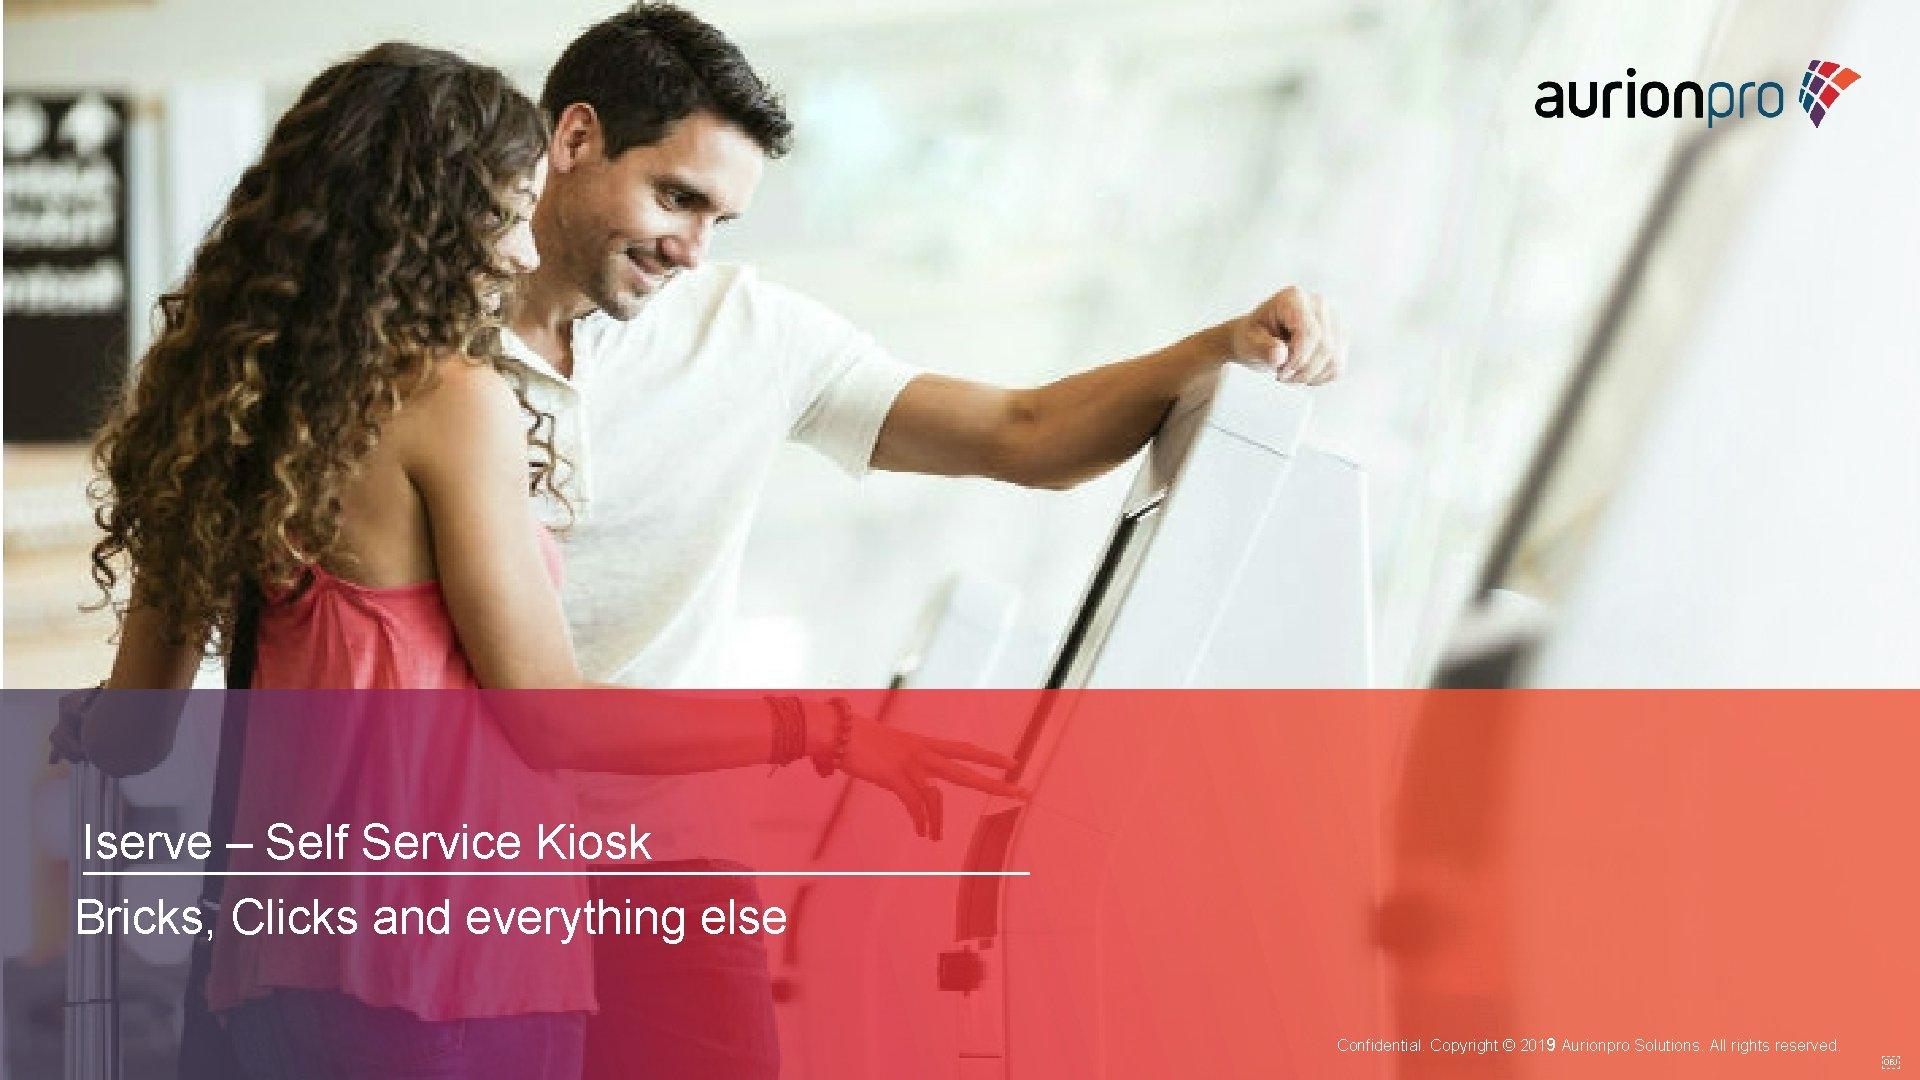 Iserve – Self Service Kiosk Bricks, Clicks and everything else Confidential. Copyright © 2019